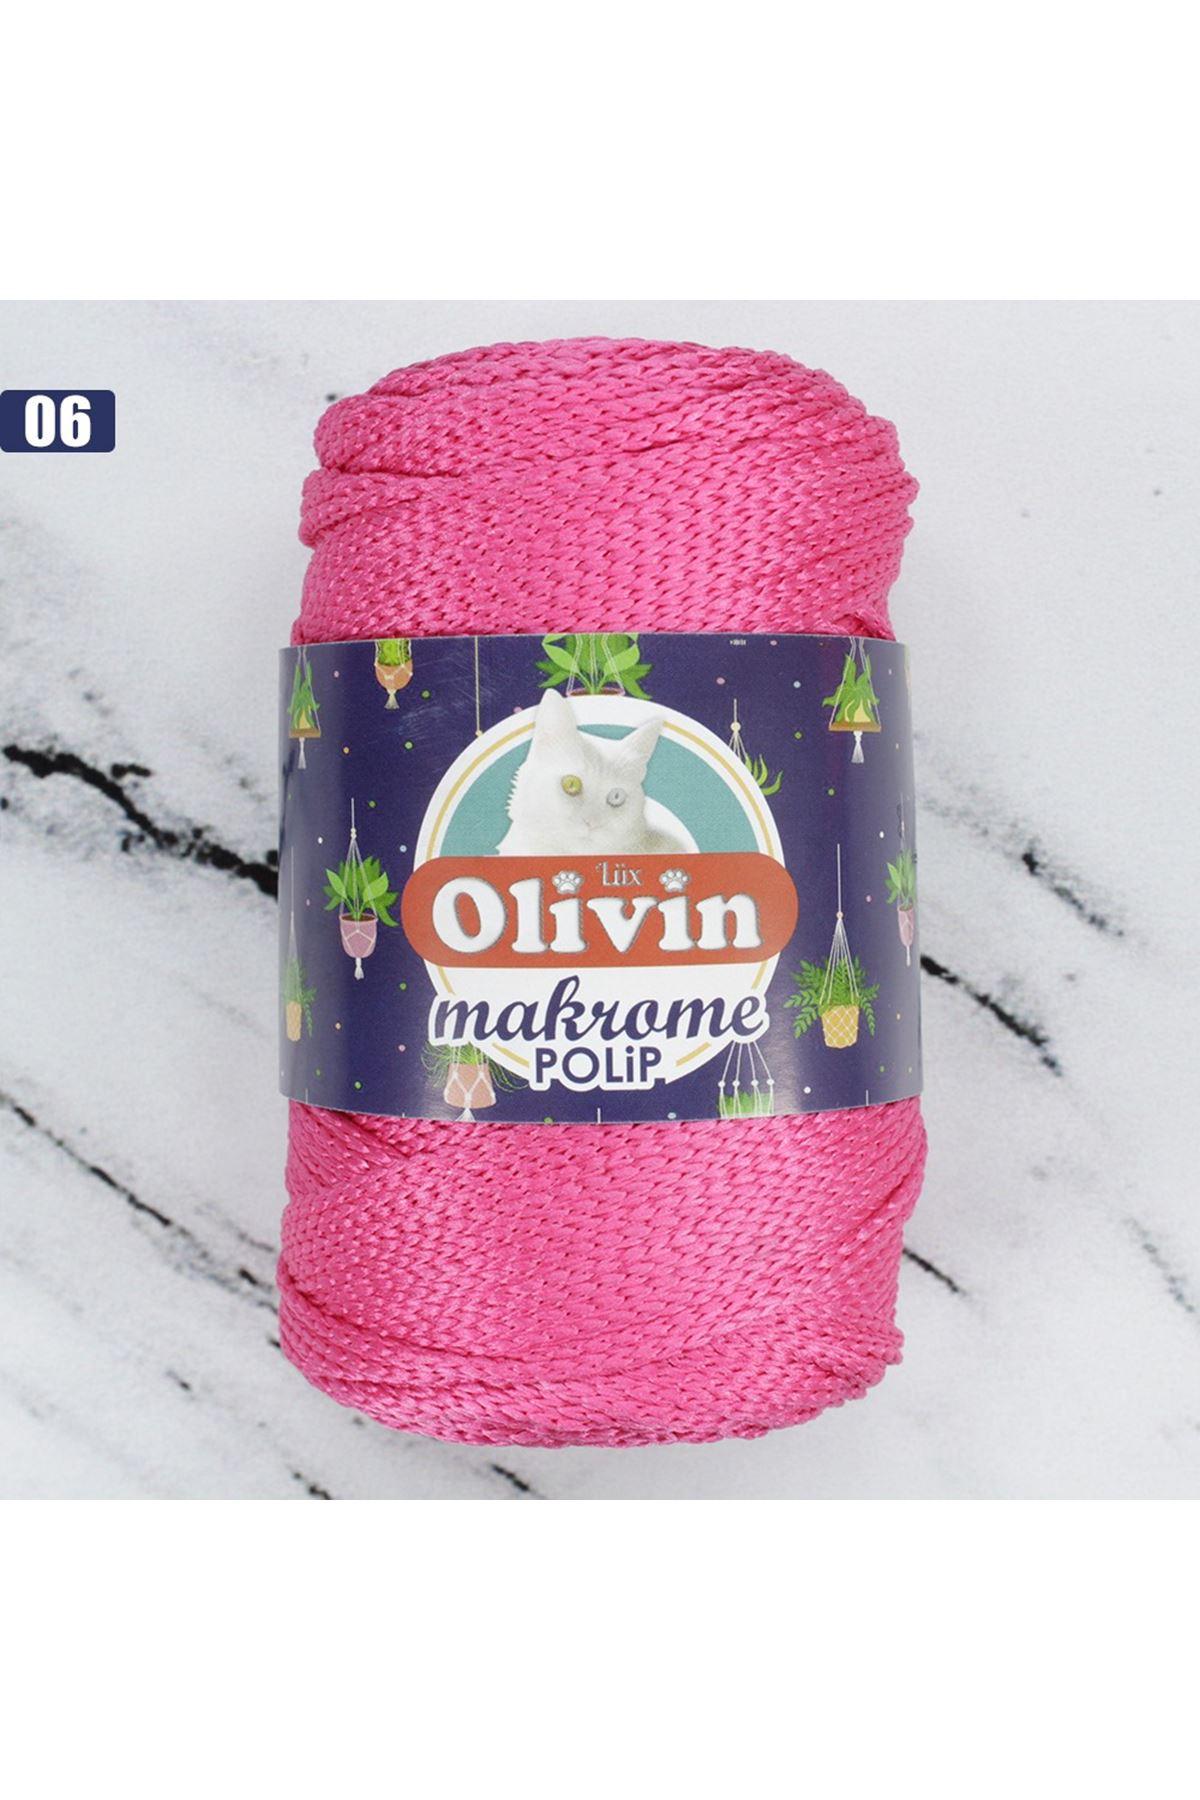 Olivin Makrome Polip 06